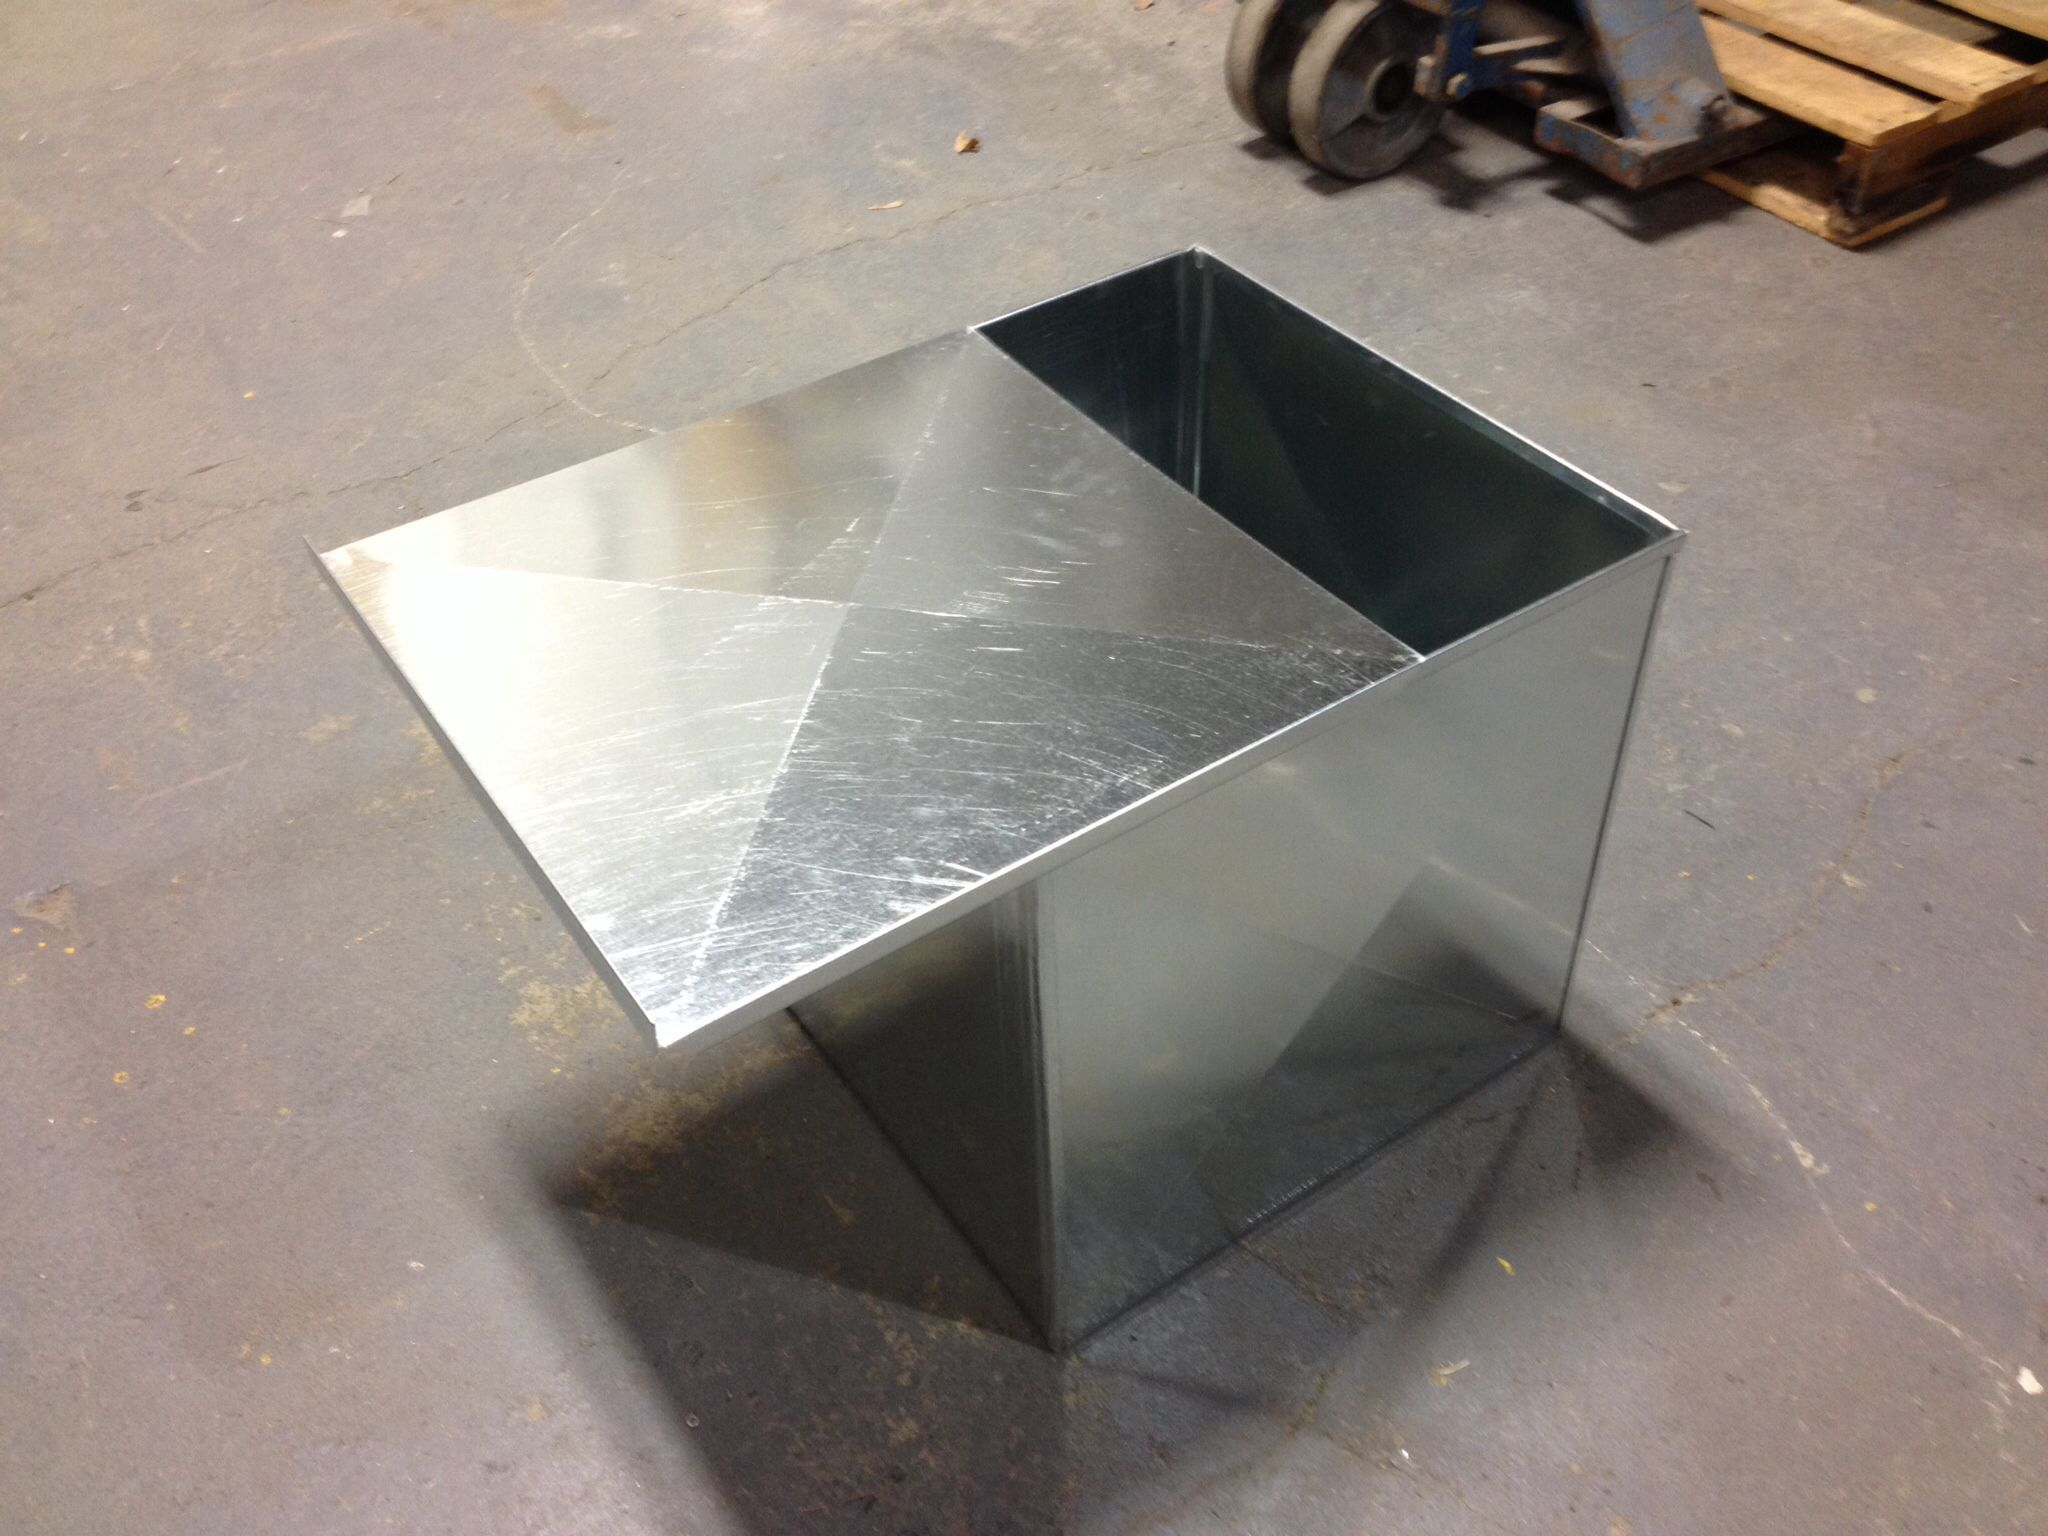 Custom 24 Gauge Sheetmetal Ash Box With Sliding Top Cover Www Kesheetmetal Com Disenos De Unas Metal Proyectos